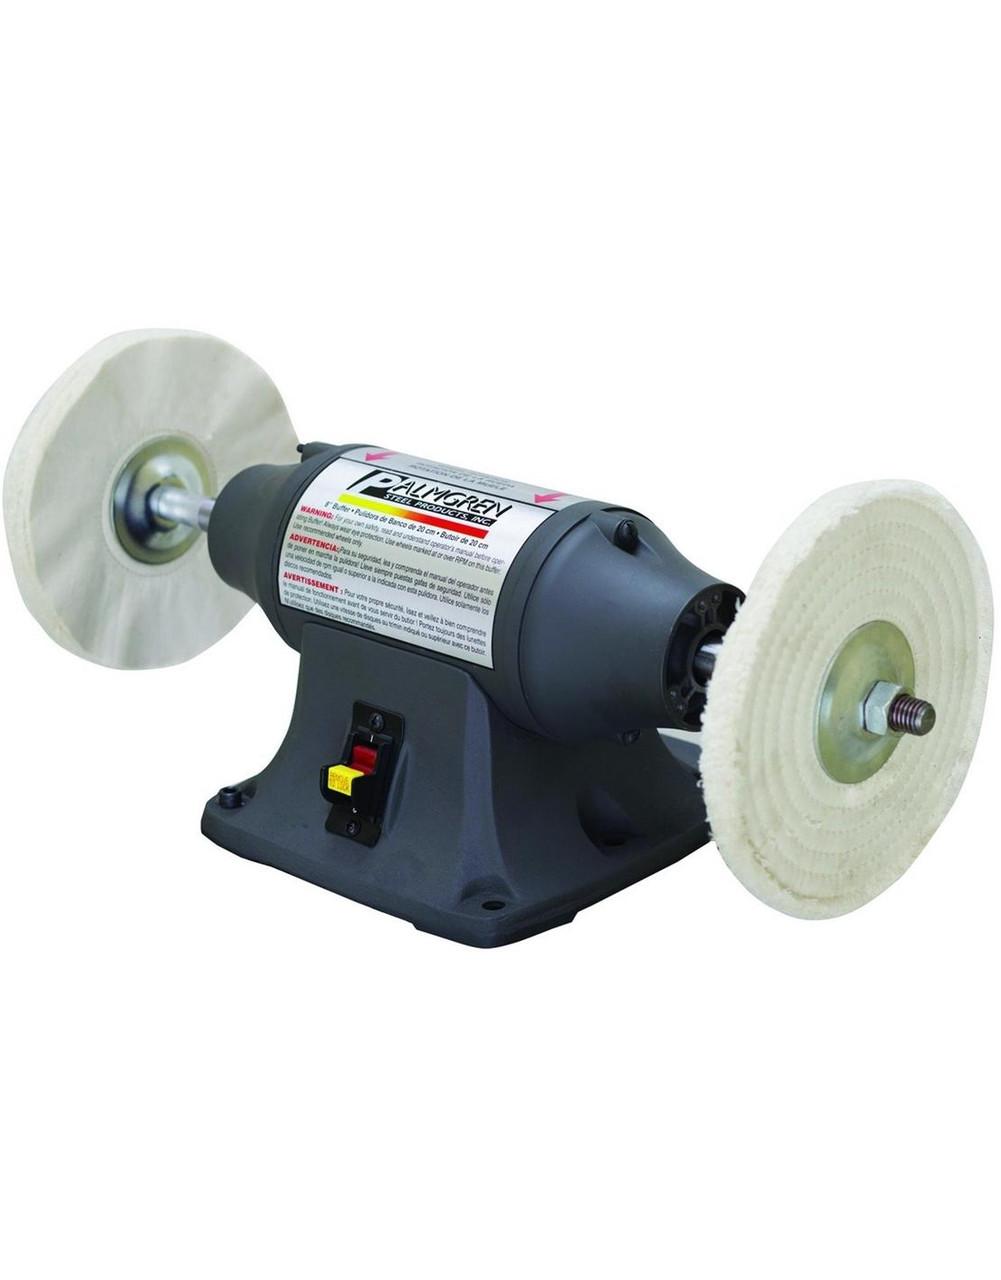 3/4HP 3450 RPM Buffing Machine